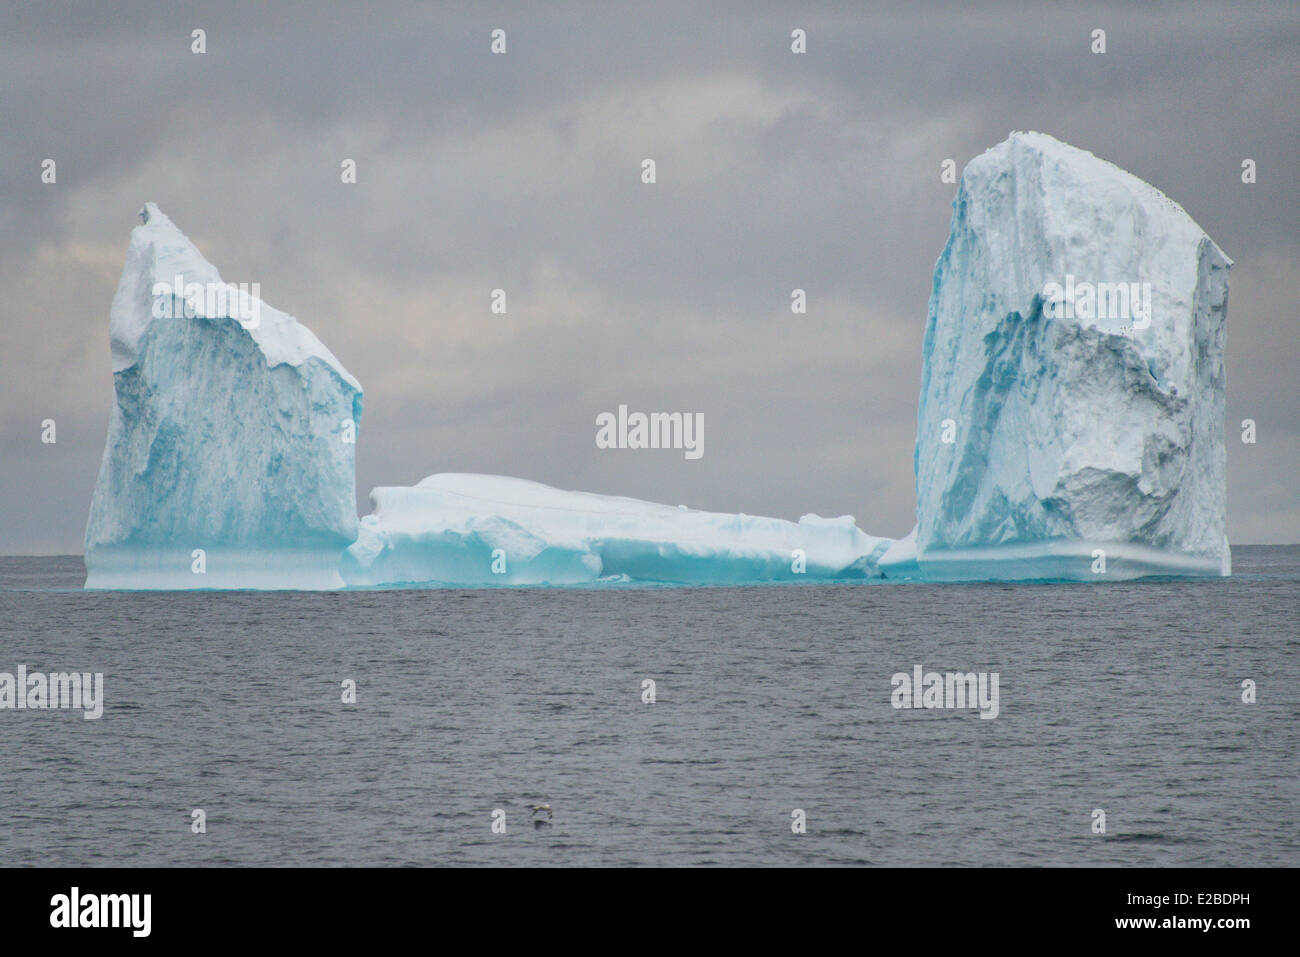 Le Groenland, Nutaarmiut, région de la baie de Baffin, Iceberg Photo Stock